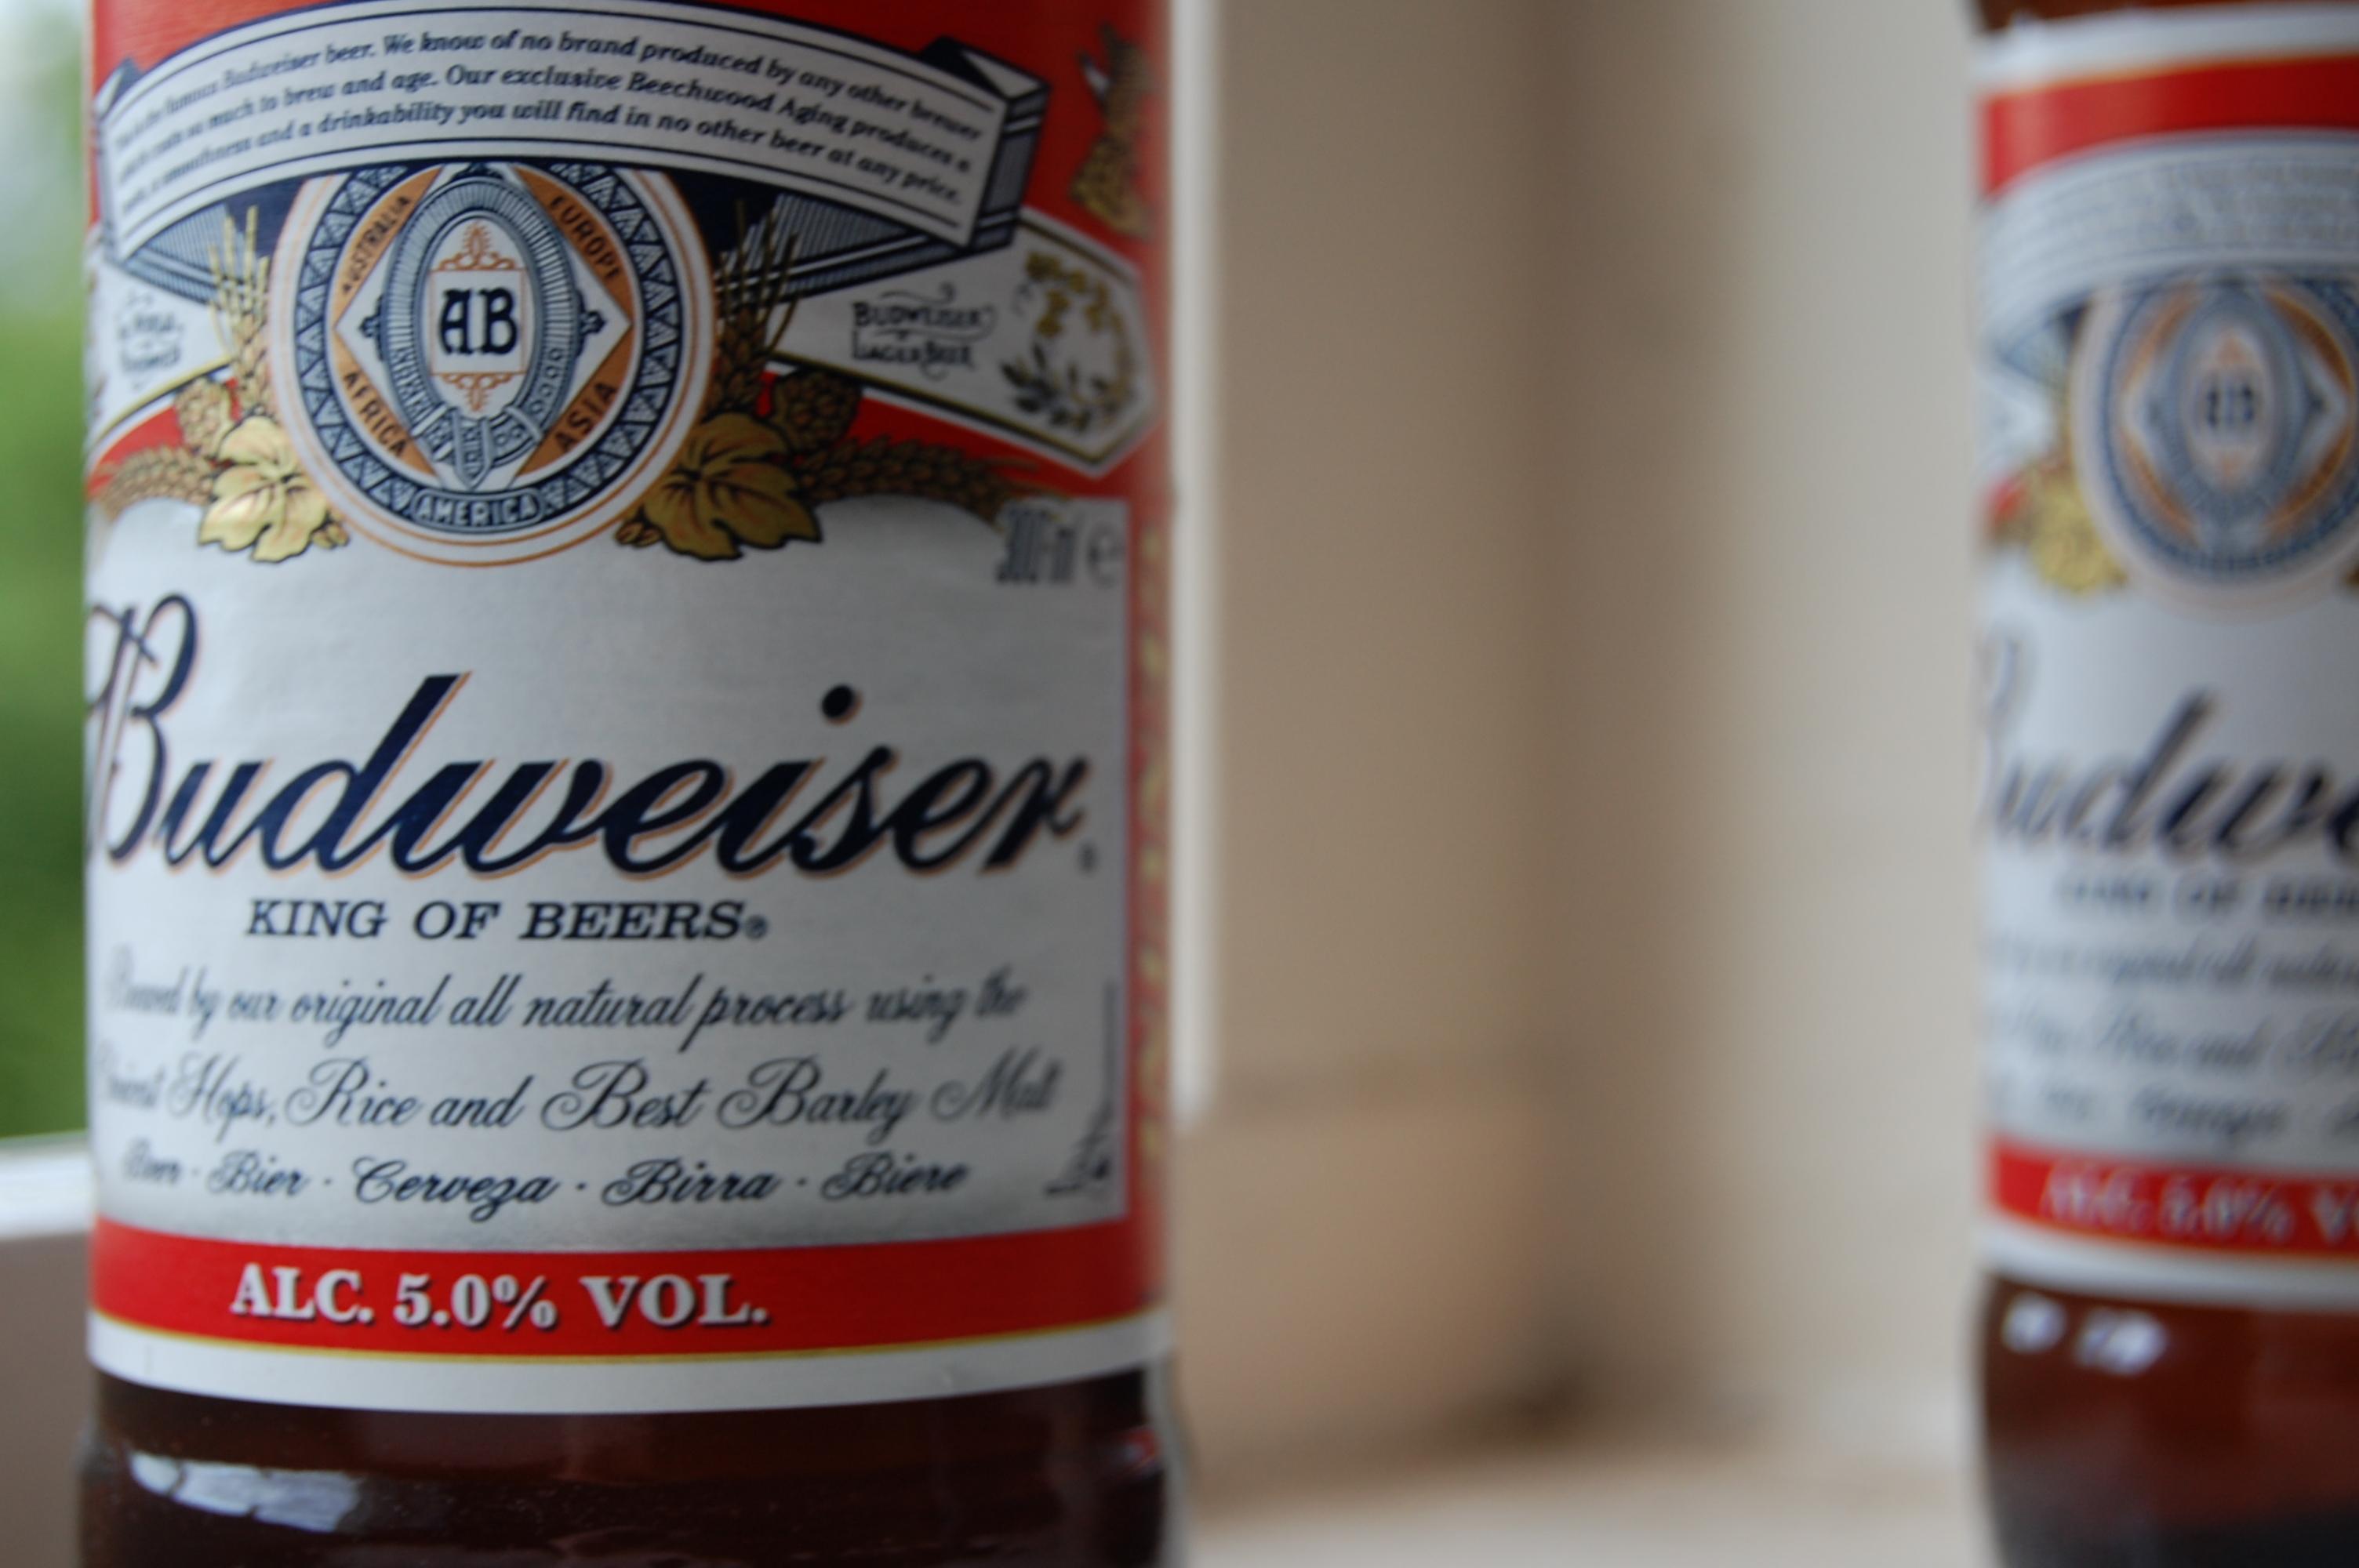 filebudweiser bottle close upjpg With budweiser bottle size